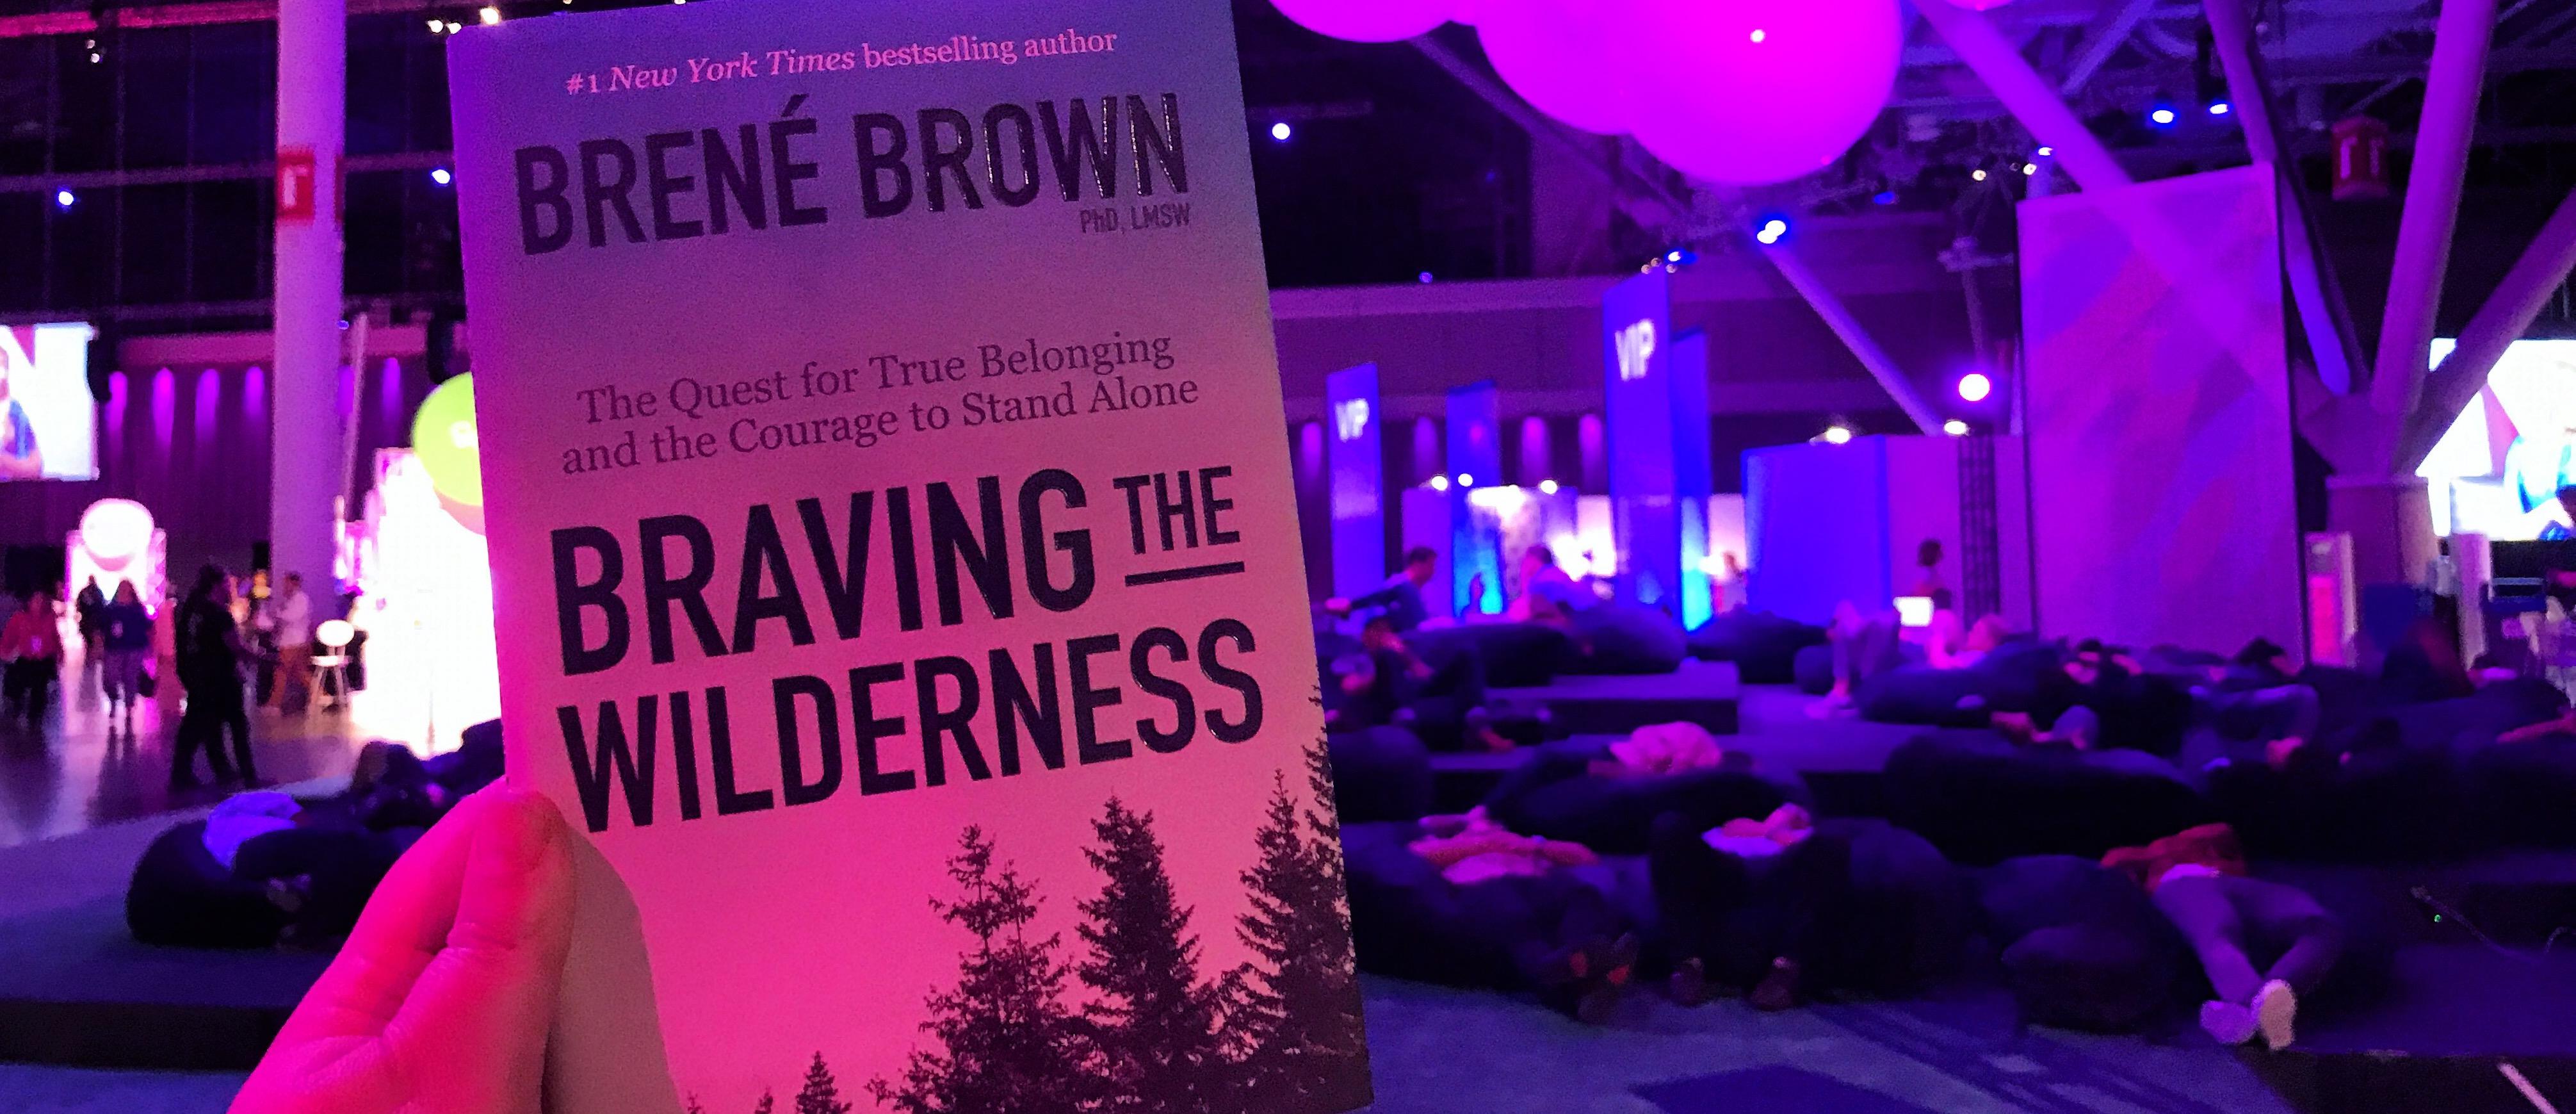 CB Book Club: Braving the Wilderness by Brené Brown (Creator's Block, Ep. 54)